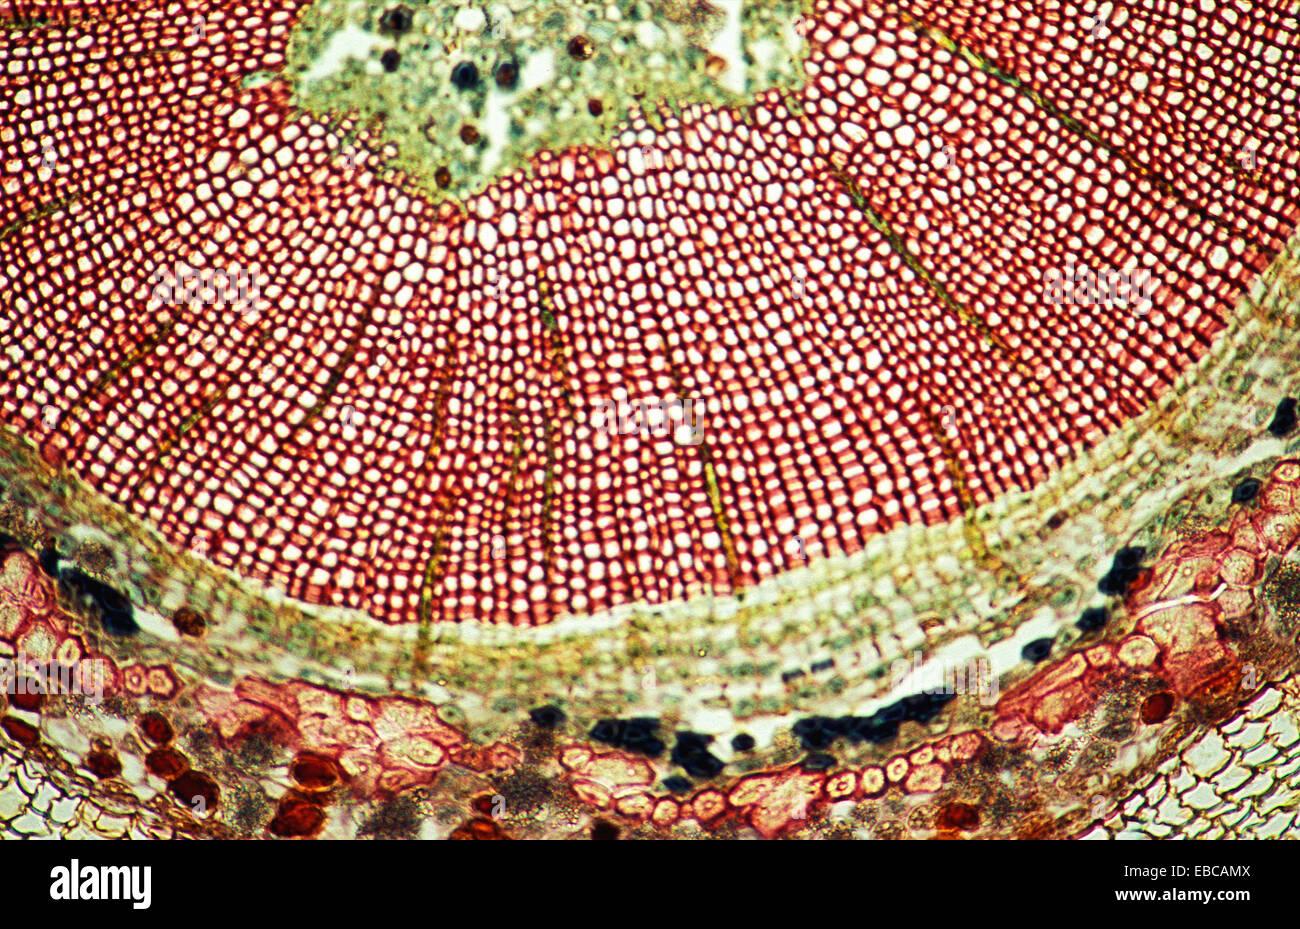 100 anatomy backgrounds Biloba biology botany bubble cell close-up ...